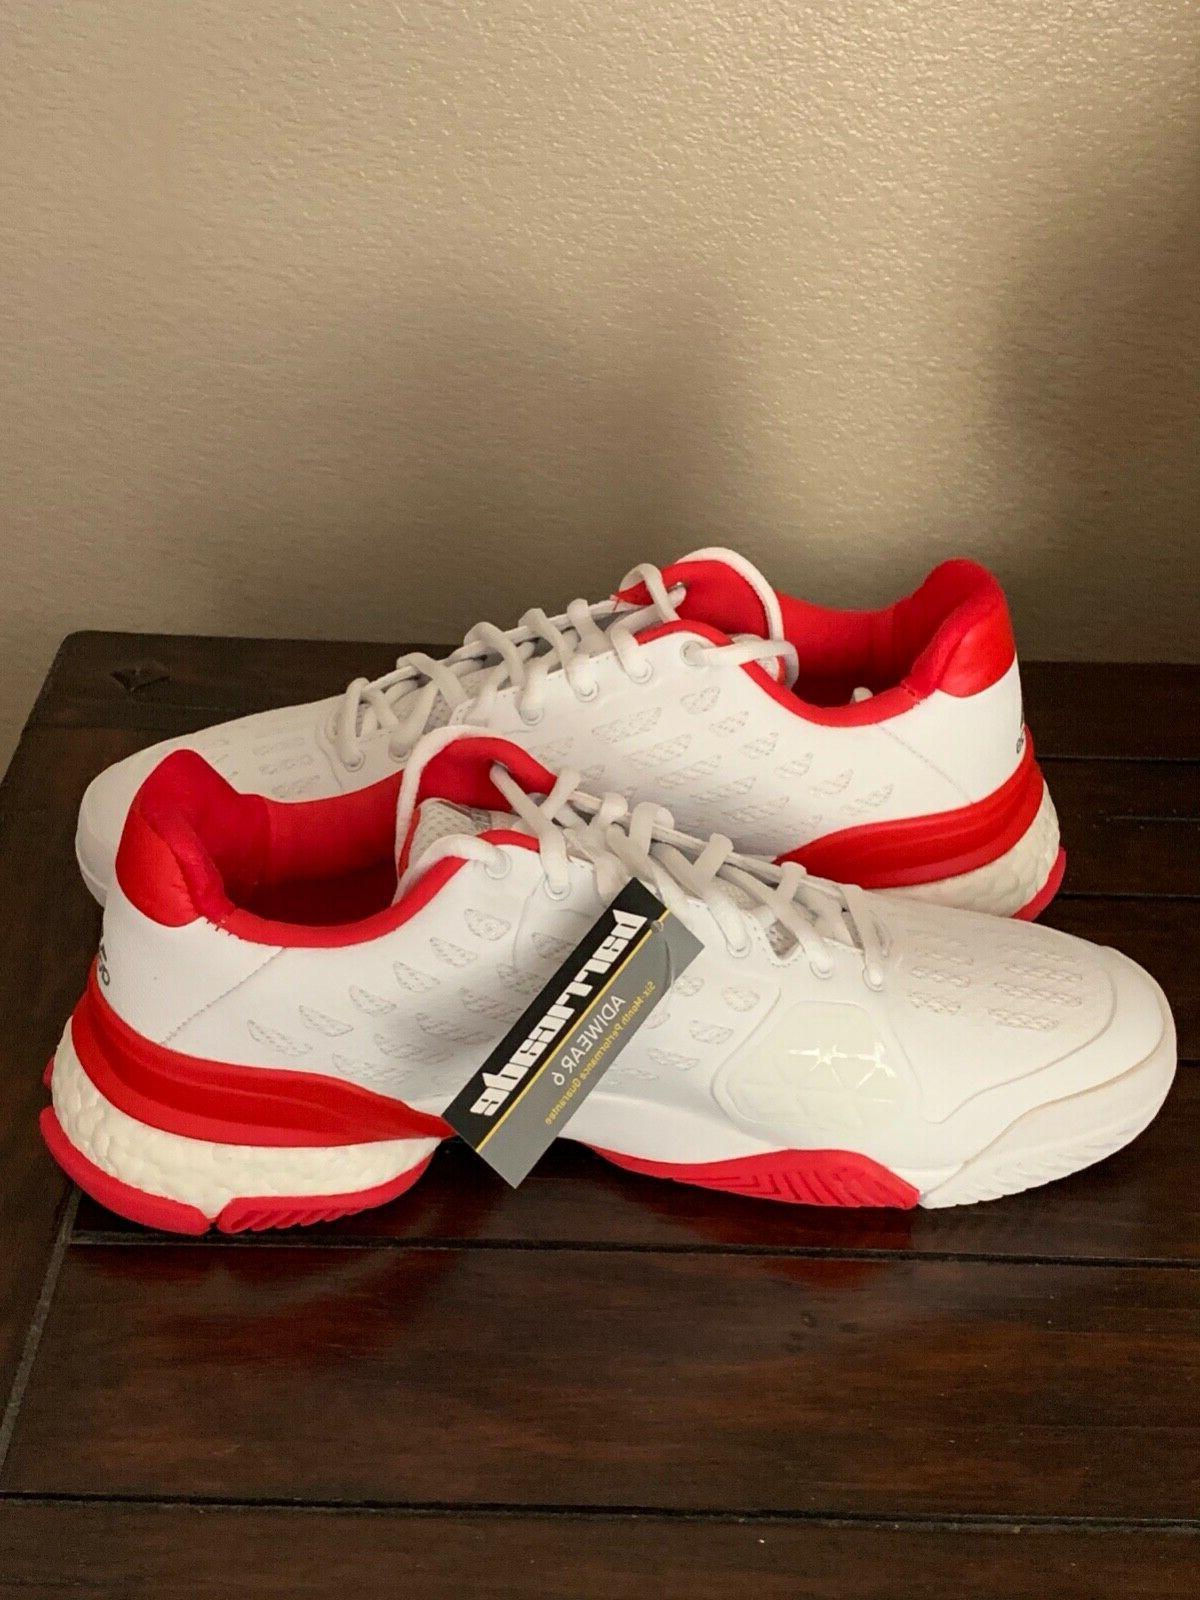 Adidas Barricade Boost Tennis AQ2262 Size